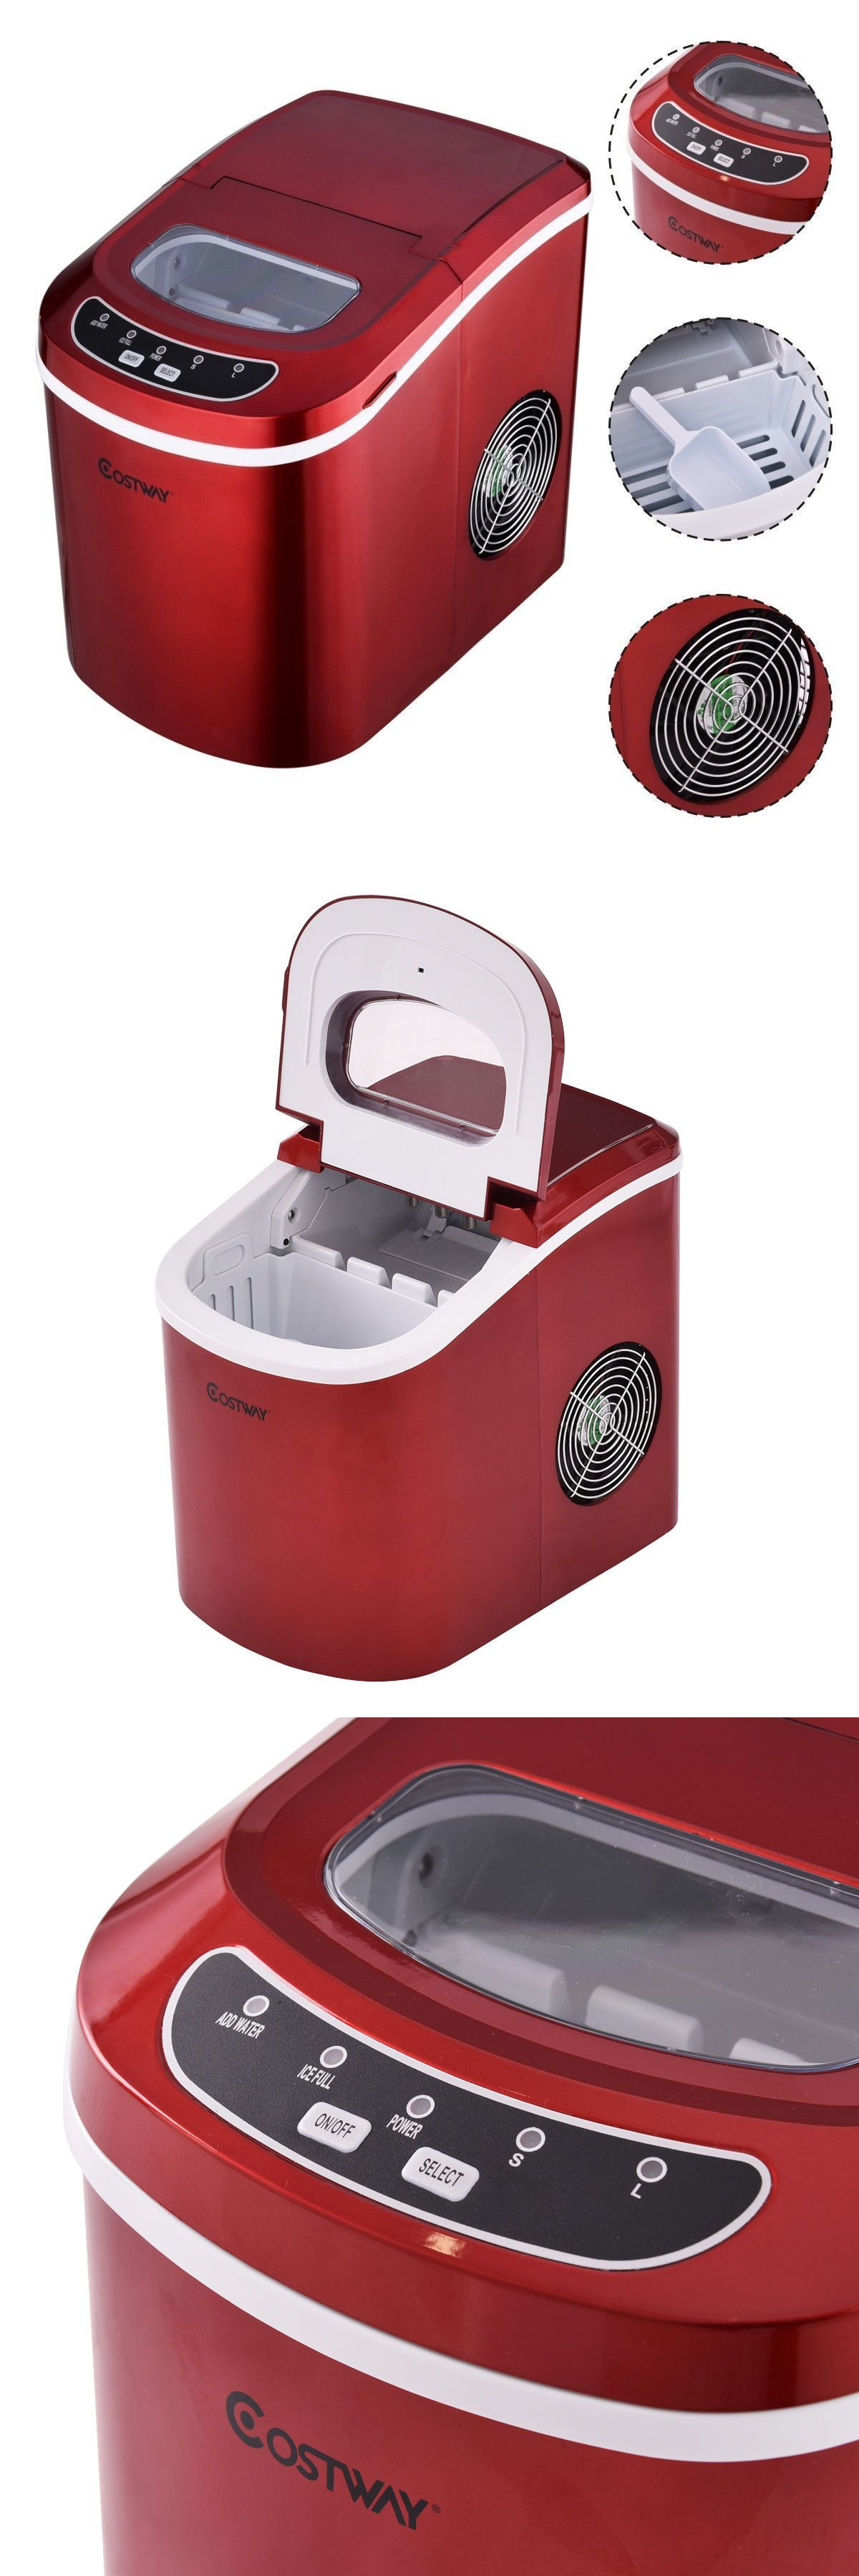 Countertop ice makers 122929 countertop ice maker machine